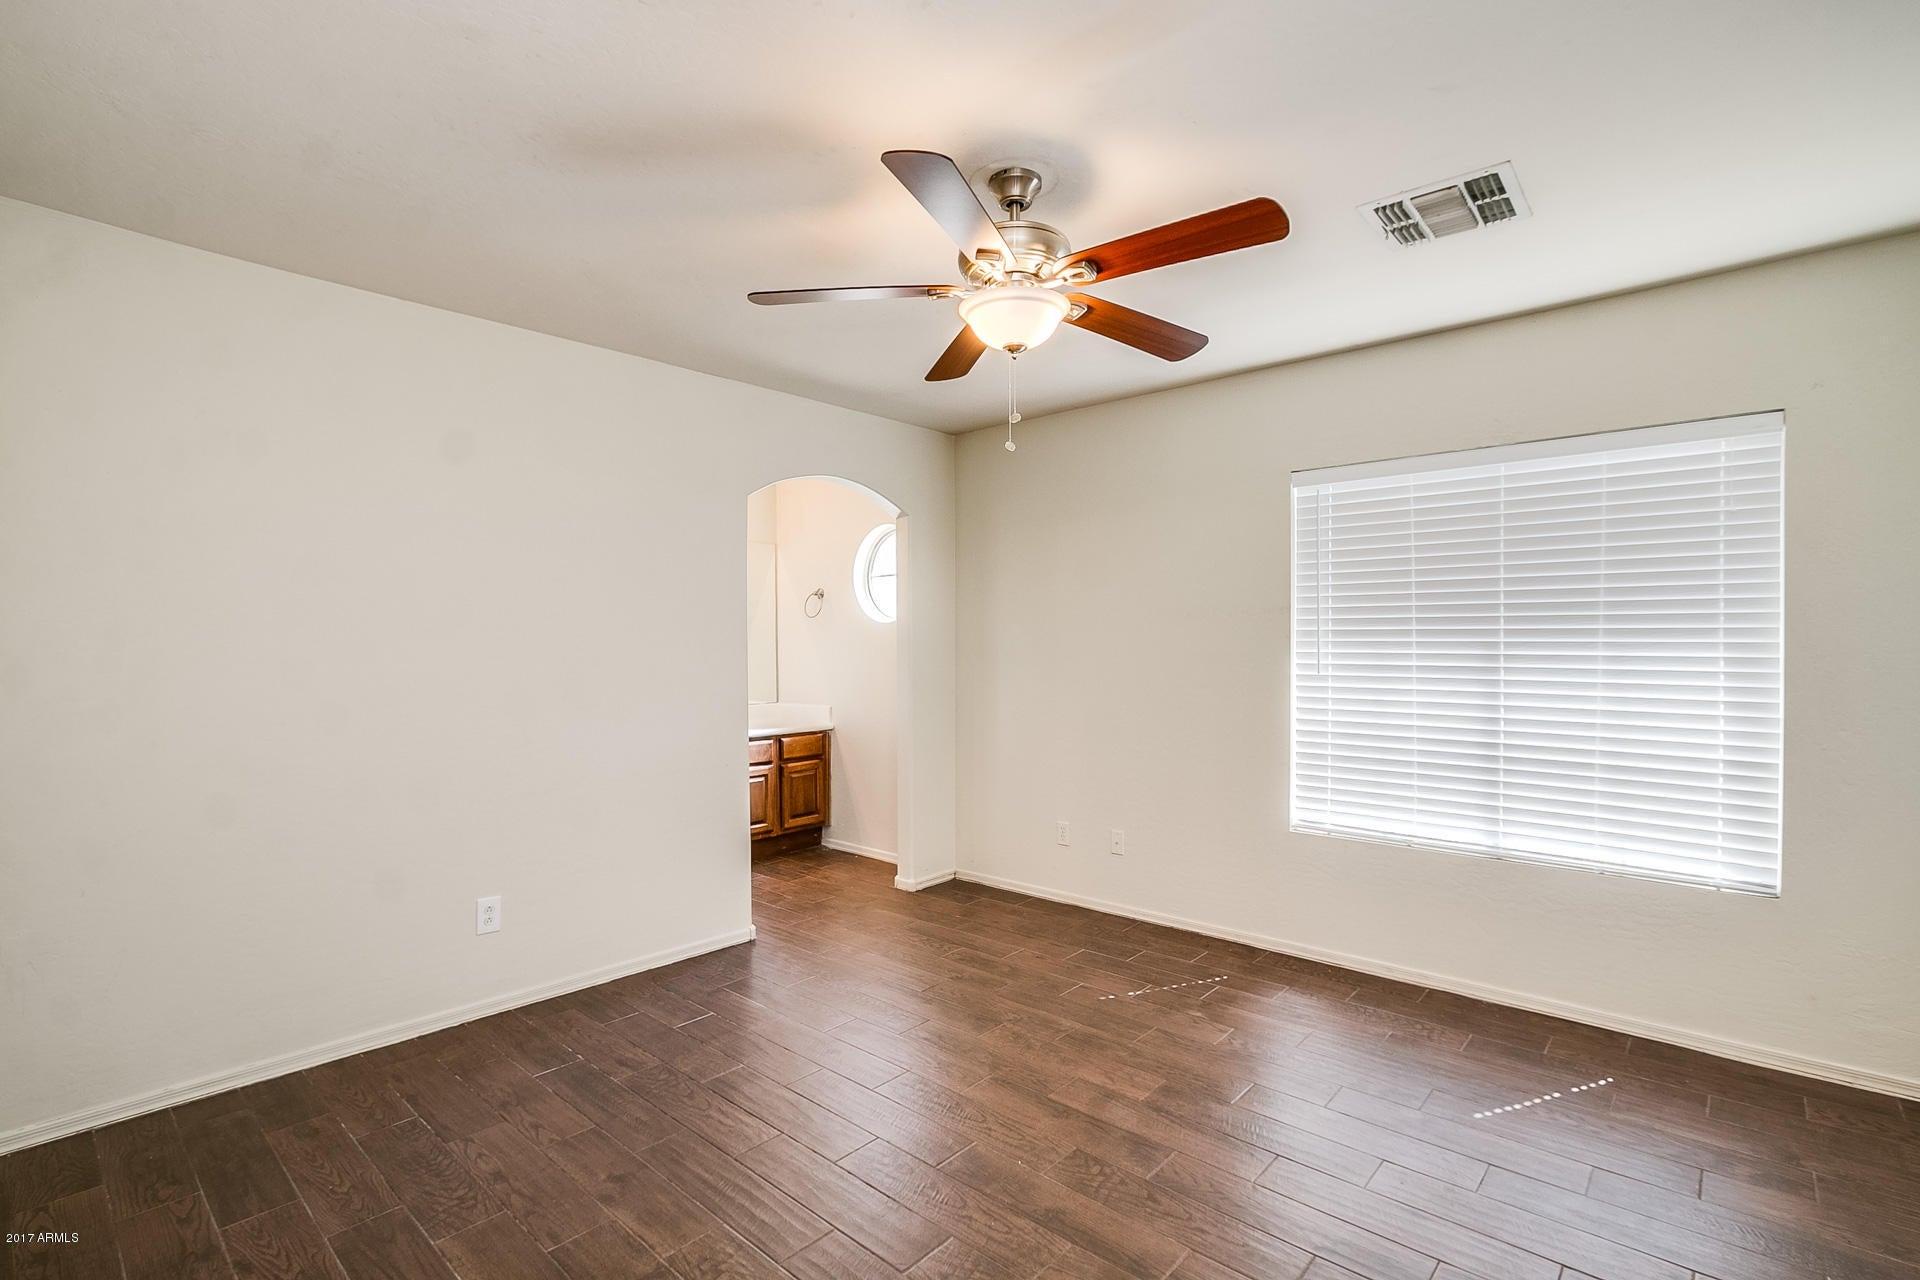 8154 W CIELO GRANDE Peoria, AZ 85383 - MLS #: 5668740